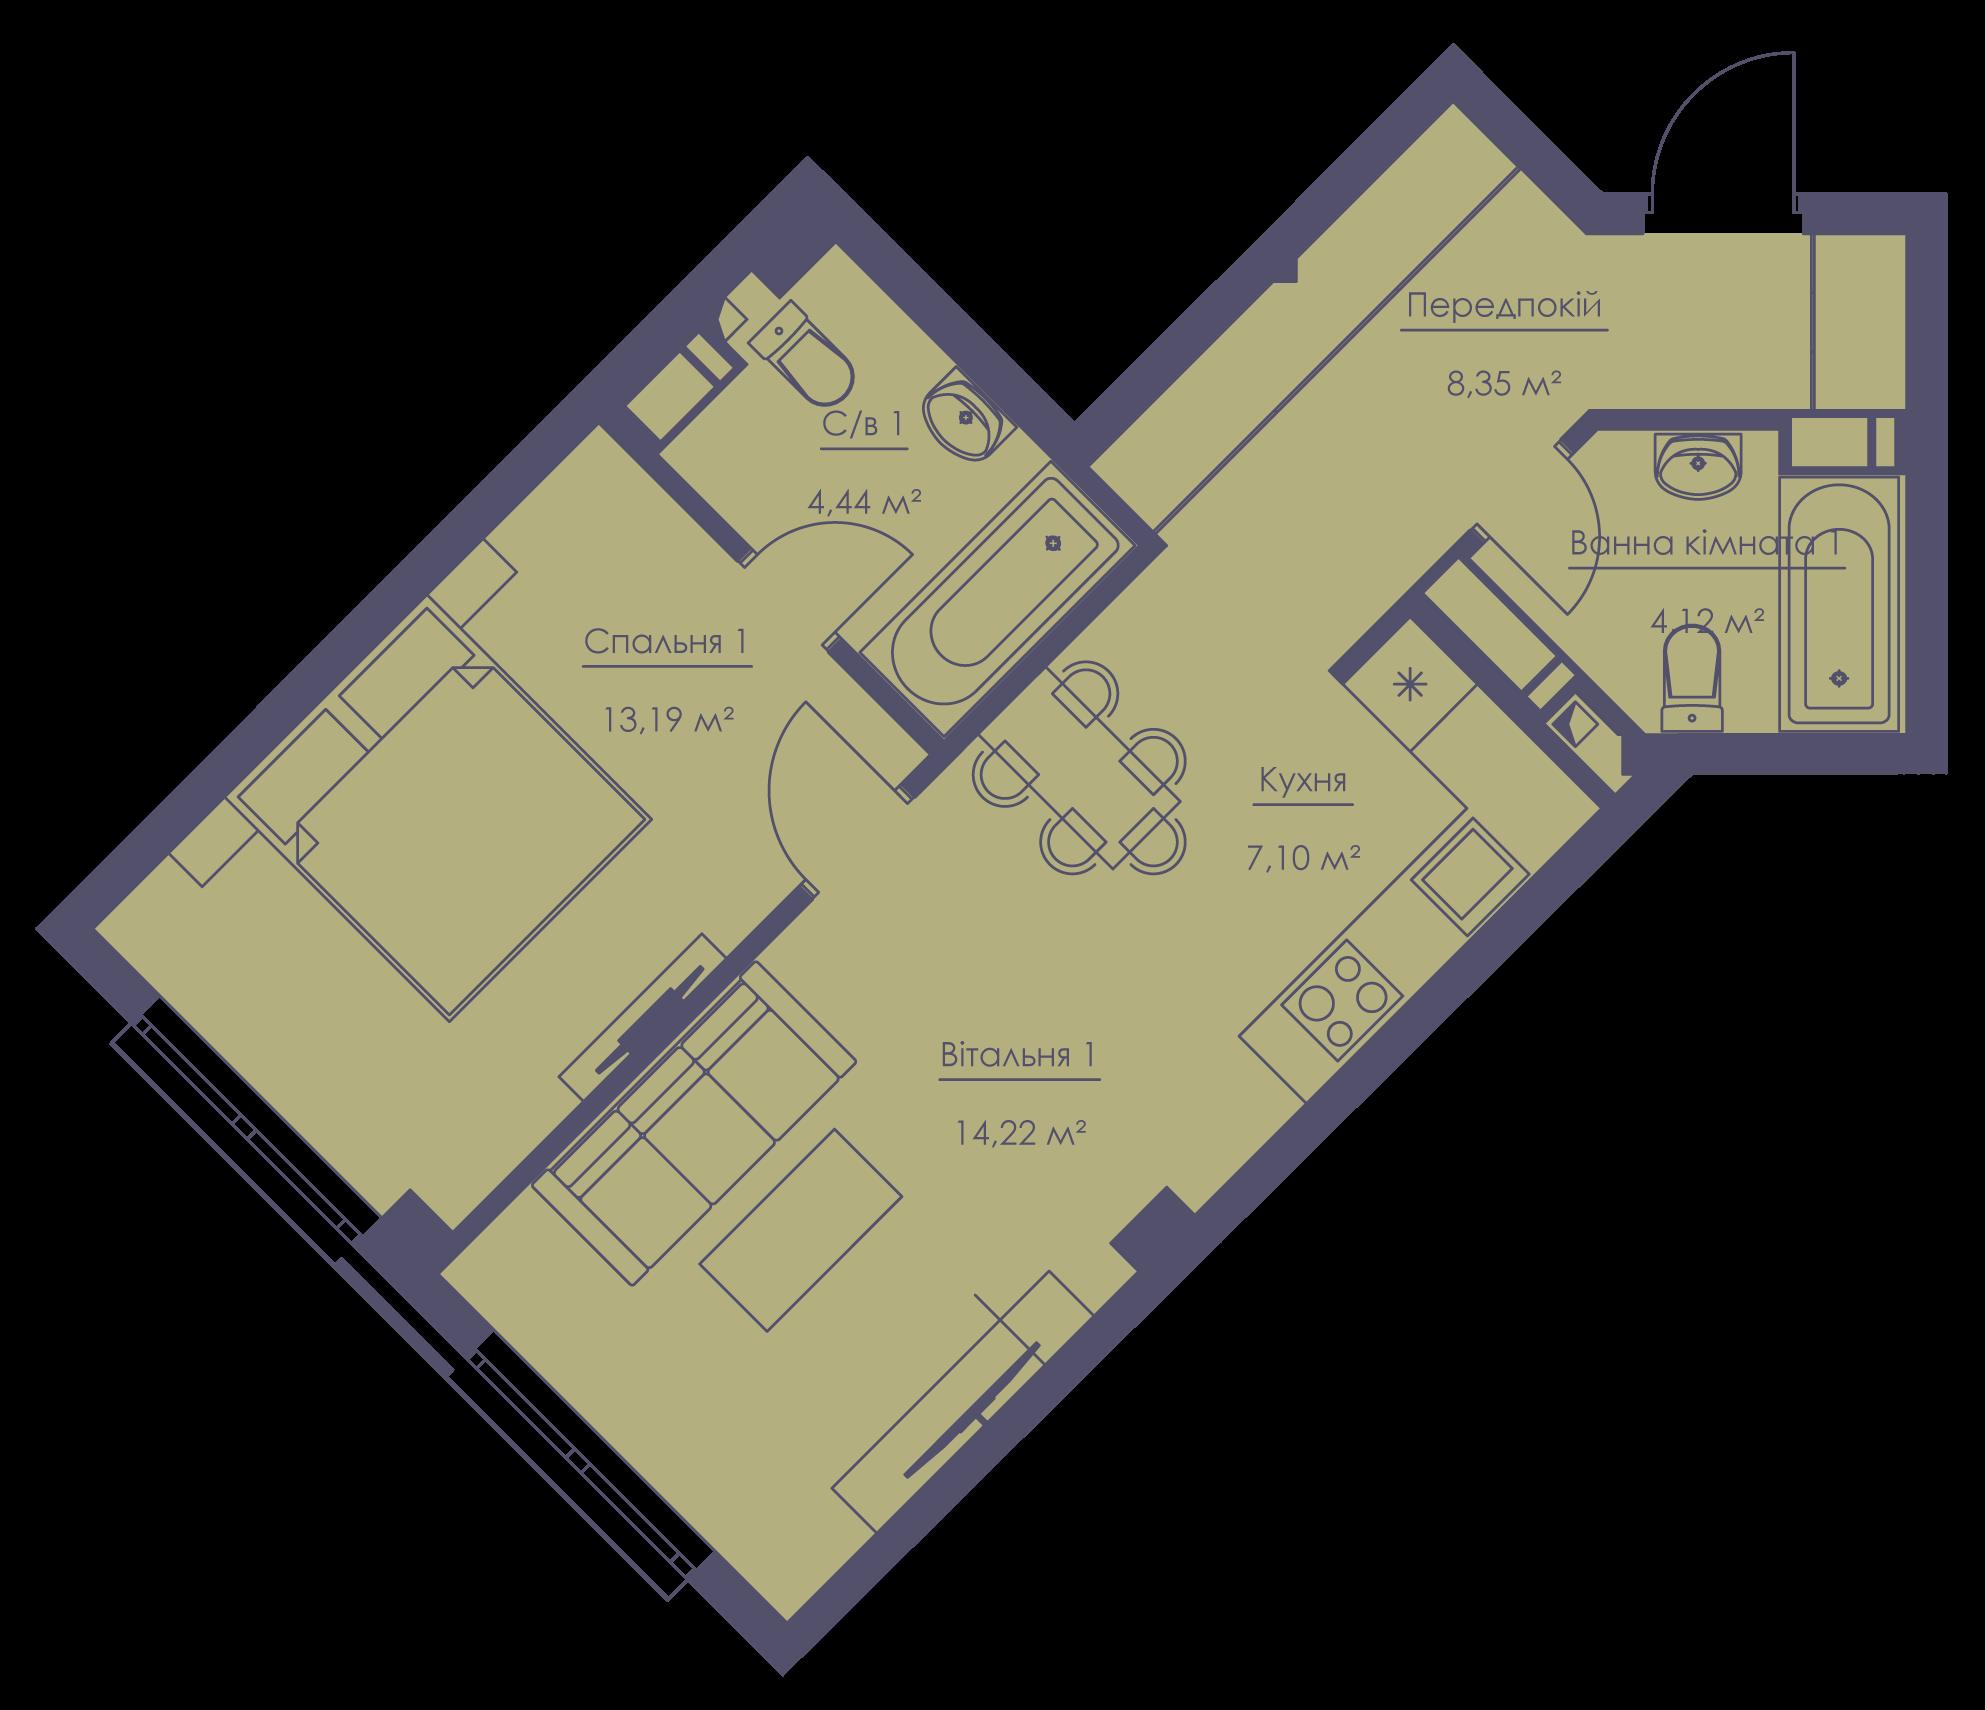 Apartment layout KV_148_3.2m_1_1_3-1